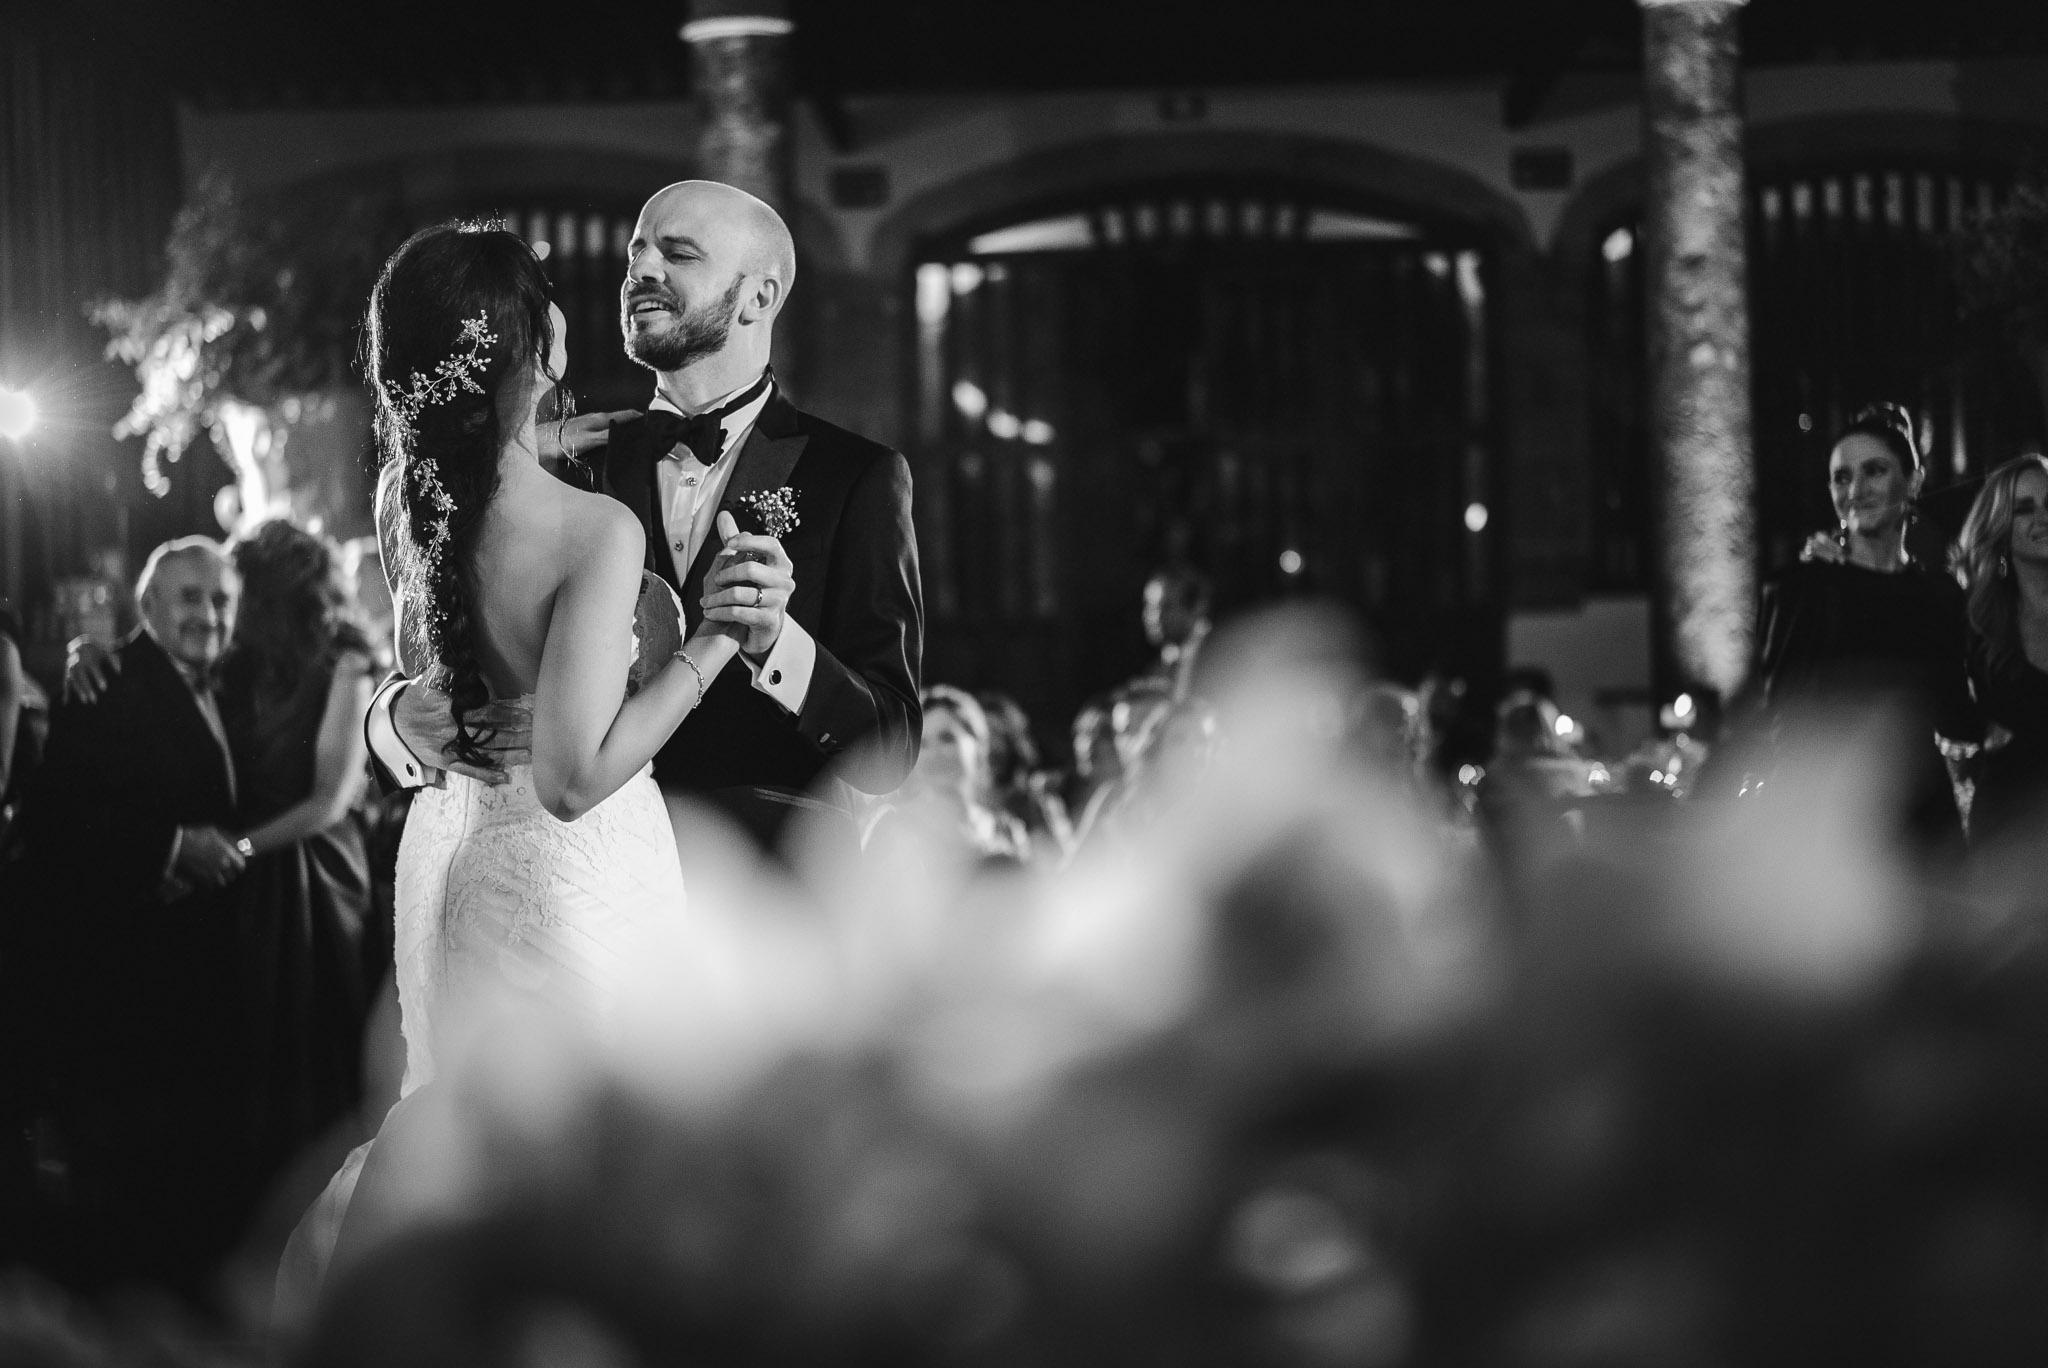 ©www.mauriziosolisbroca.com-20161002maurizio-solis-broca-mexico-canada-wedding-photographer20161002DSC08314-Edit.jpg